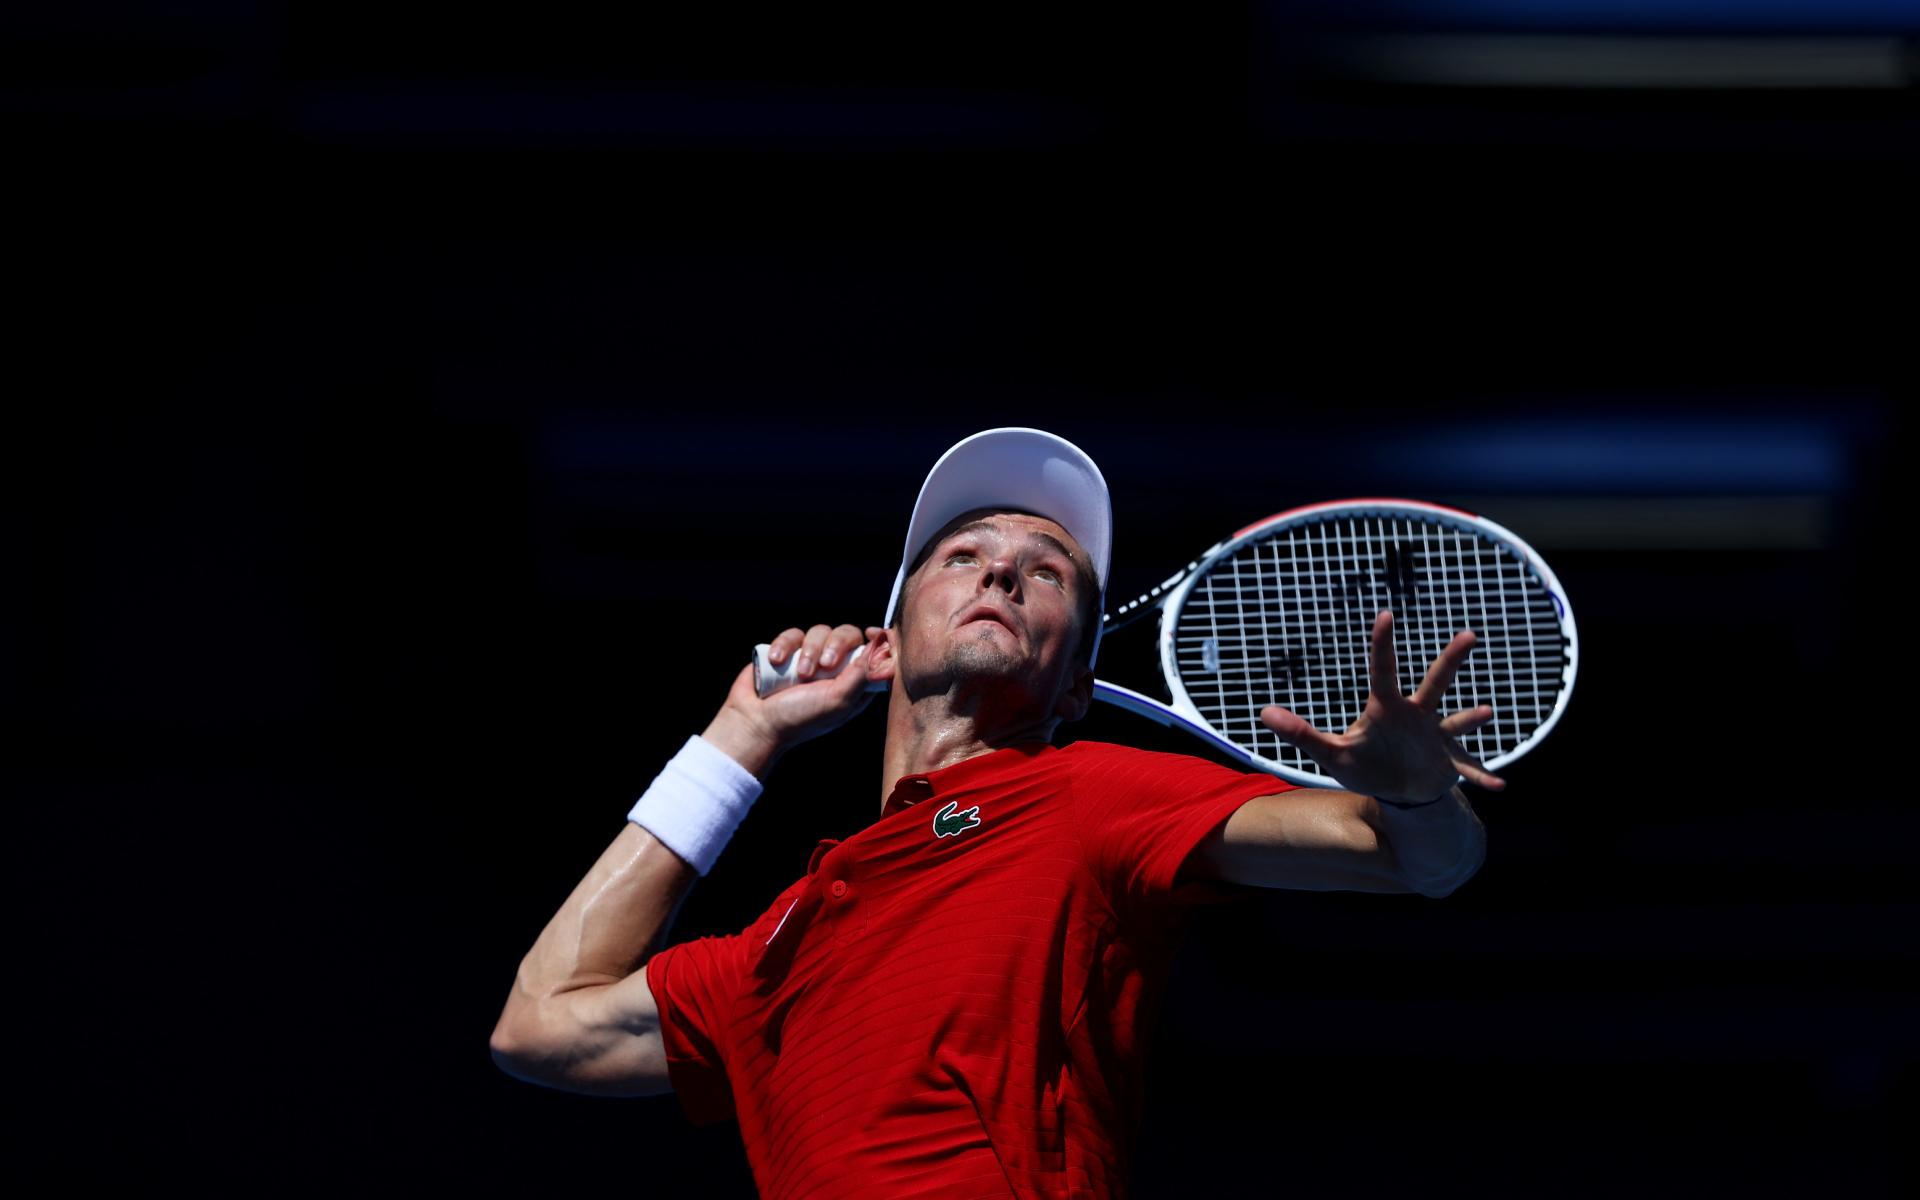 Фото: Даниил Медведев  (Photo by Clive Brunskill/Getty Images)